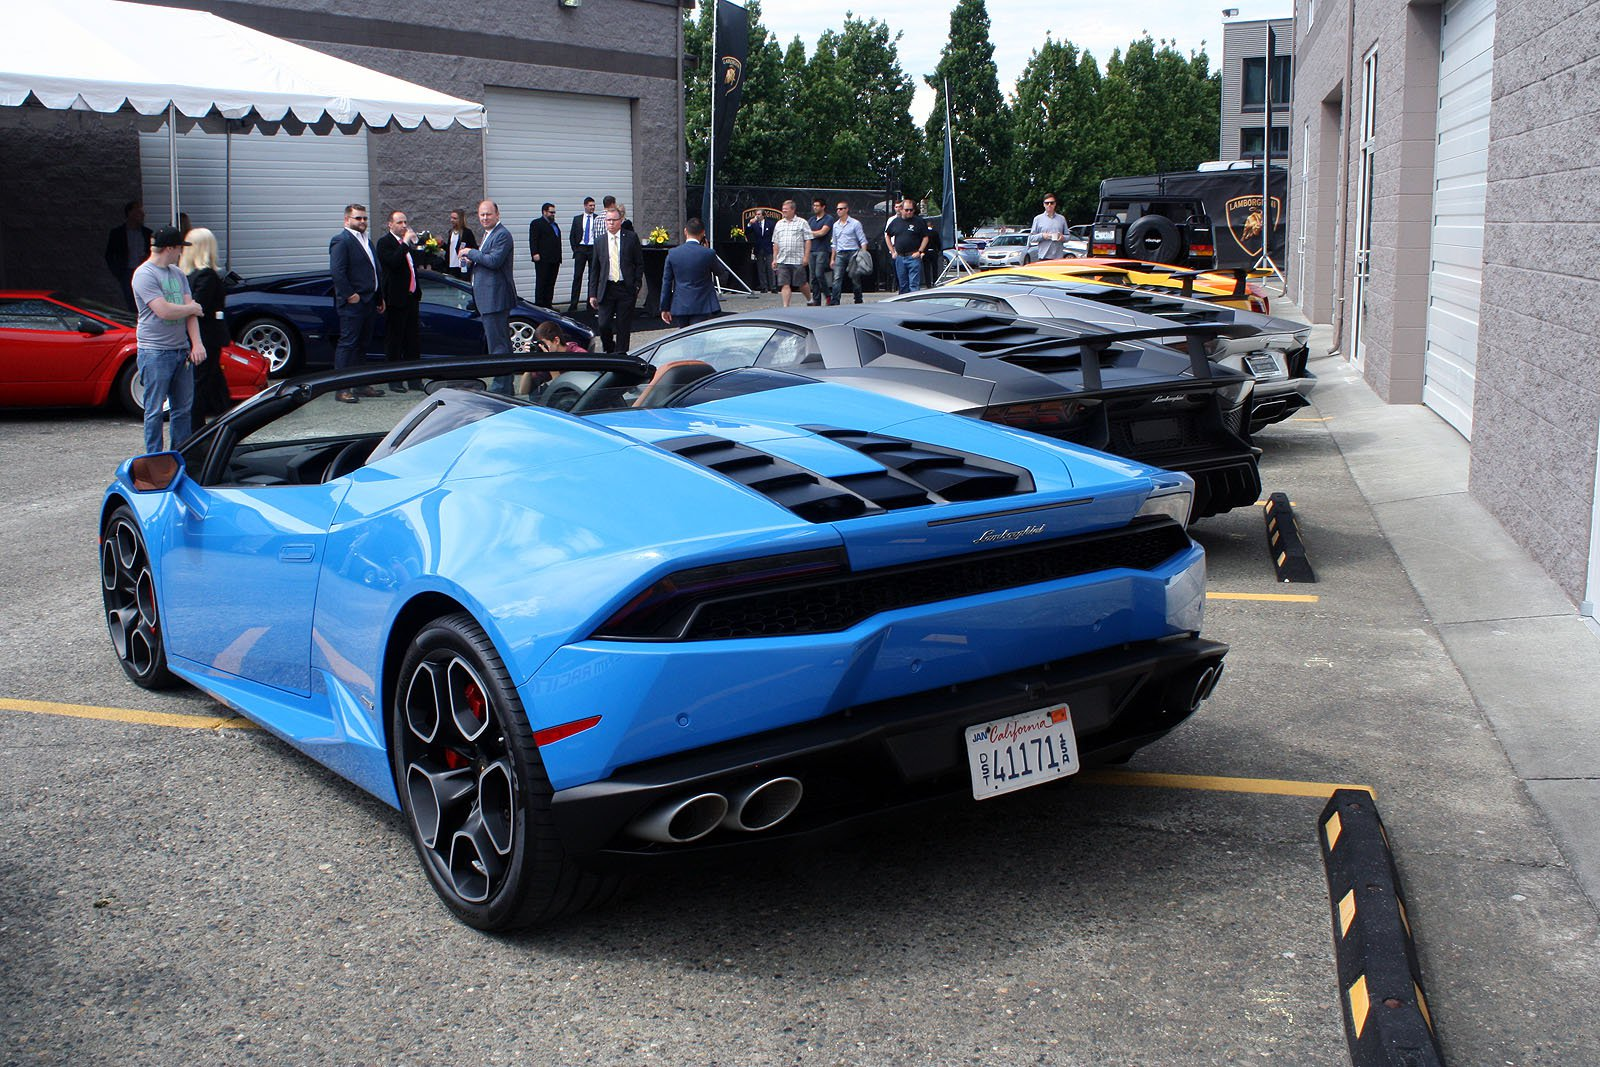 Lamborghini-ACSL-Grand-Opening-56